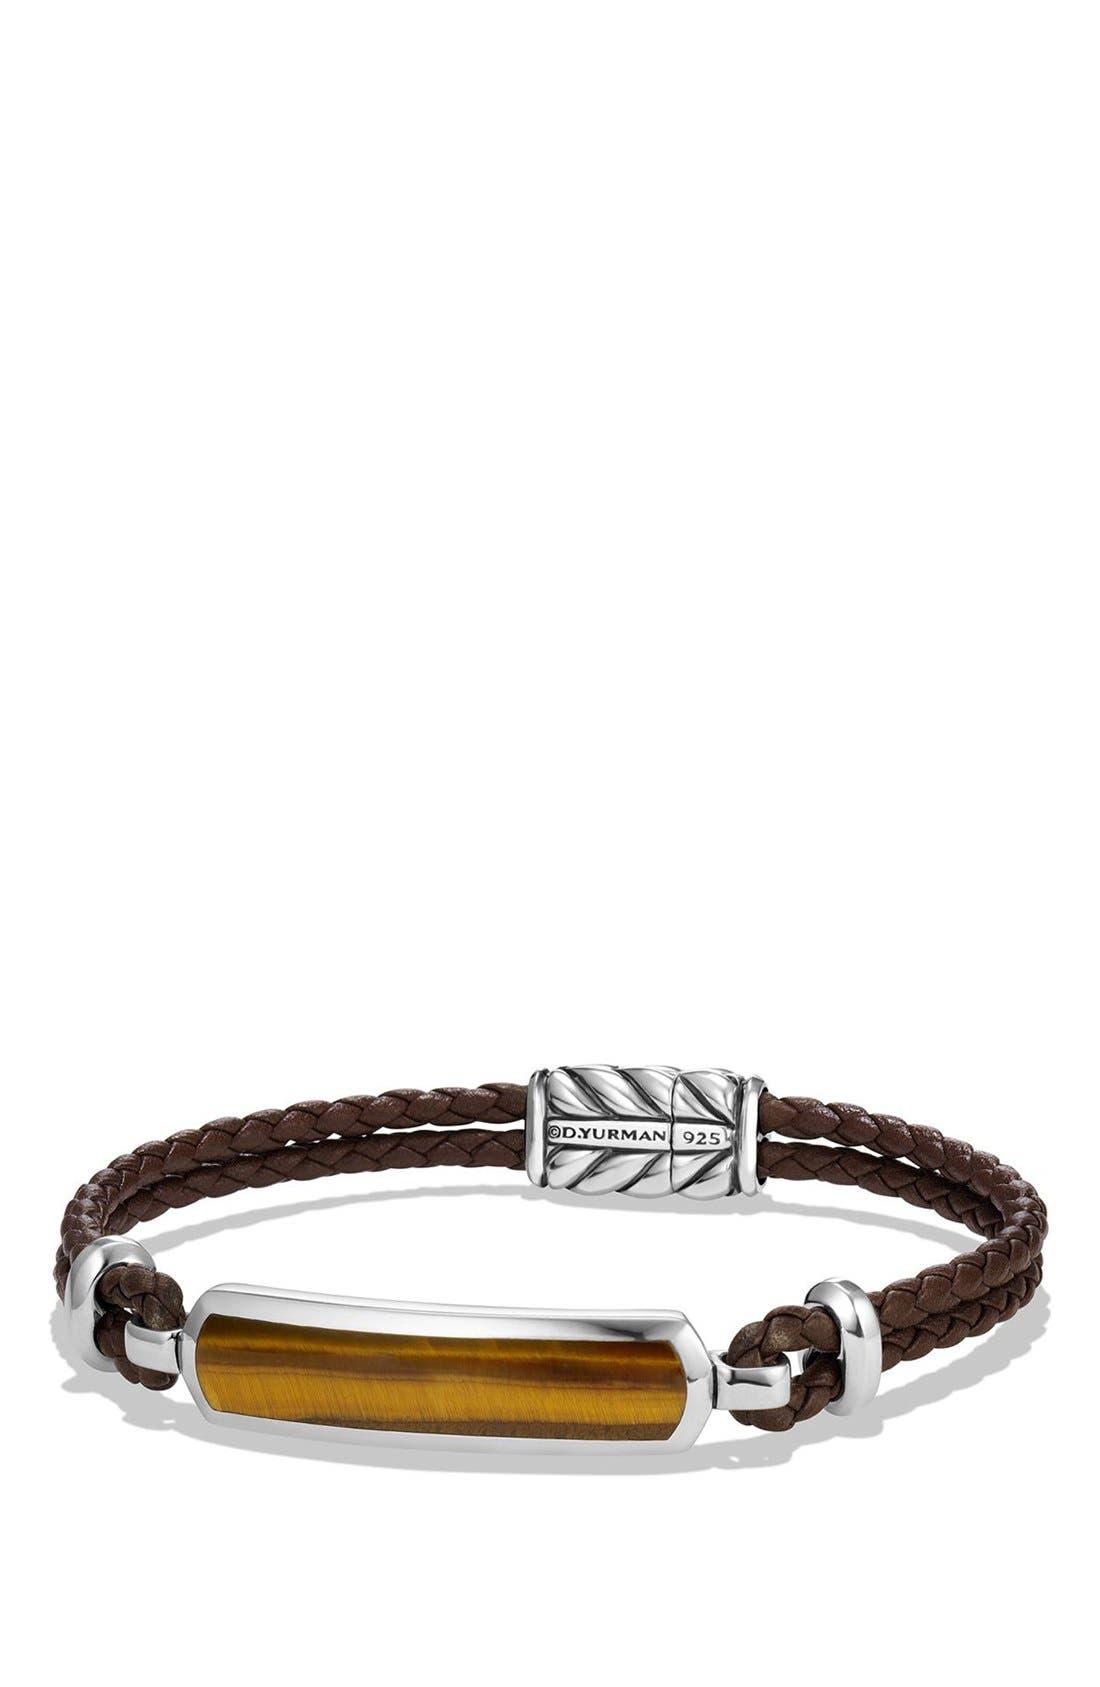 Bar Station Leather Bracelet,                         Main,                         color, Silver/ Tigers Eye